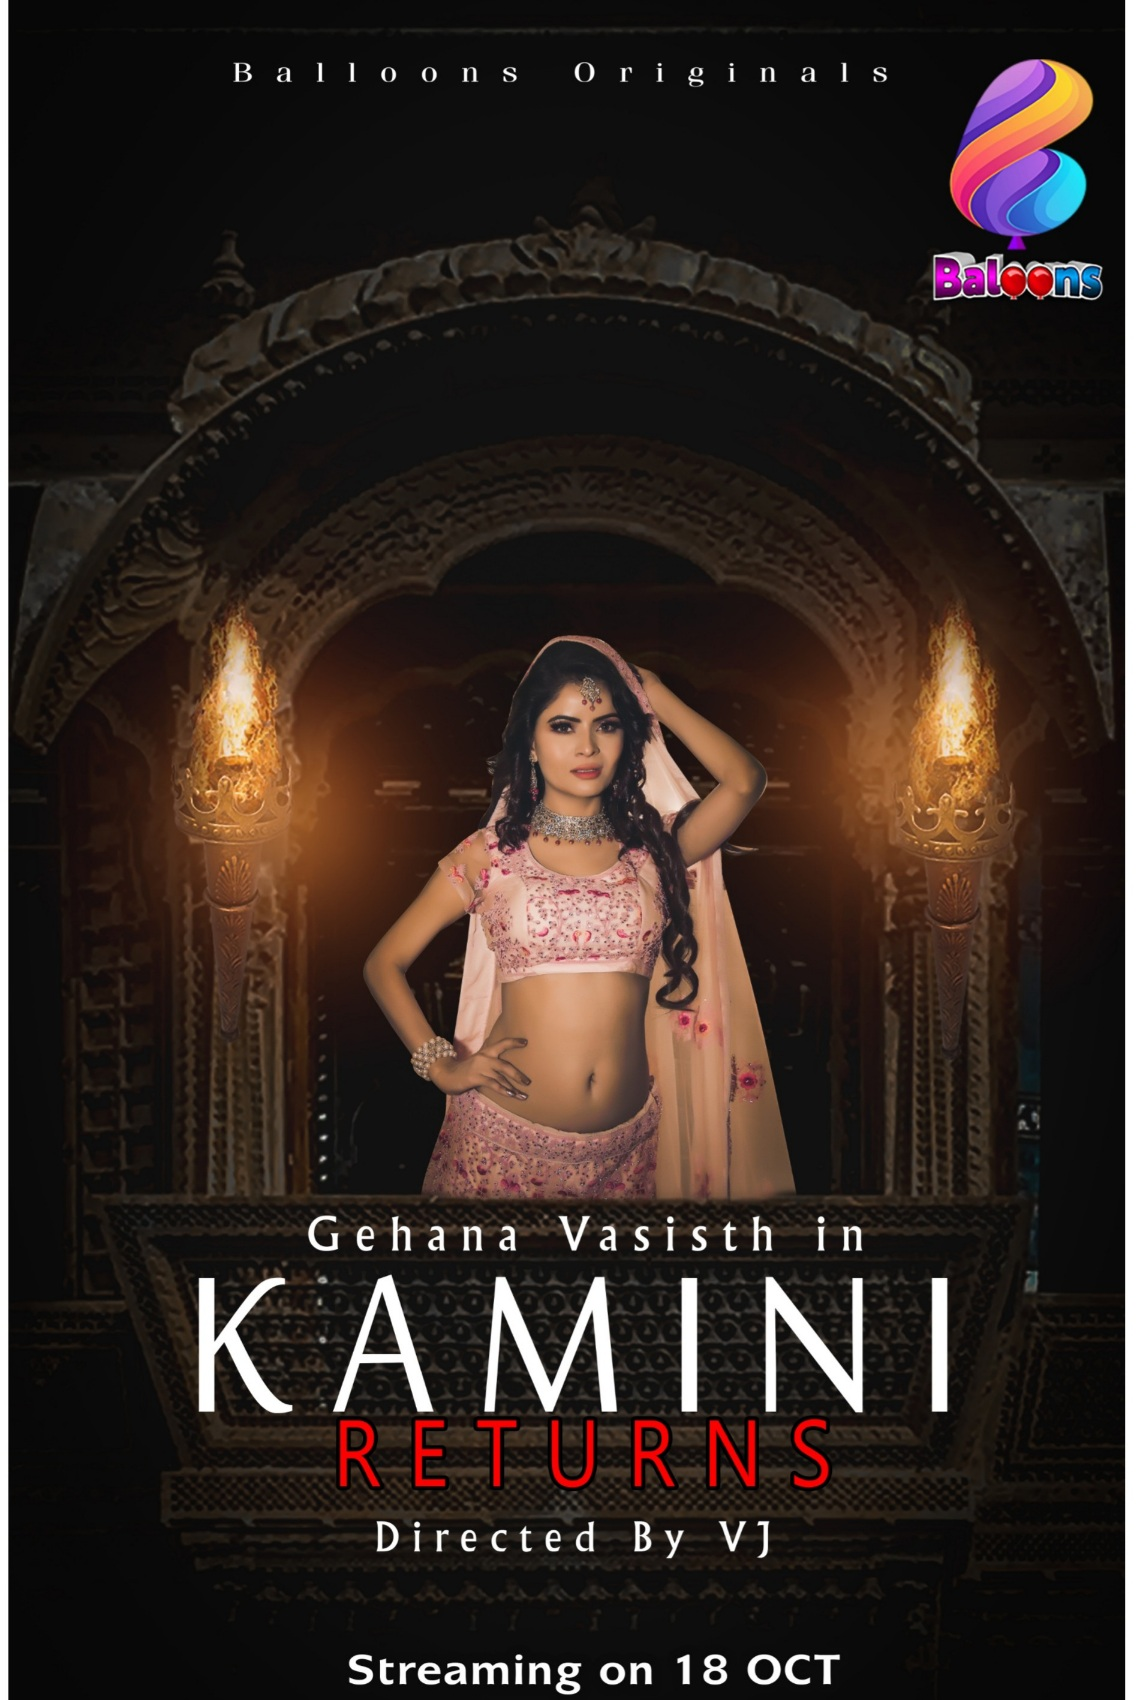 Kamini Returns 2020 Hindi S01E03 Balloons 720p HDRip 290MB x264